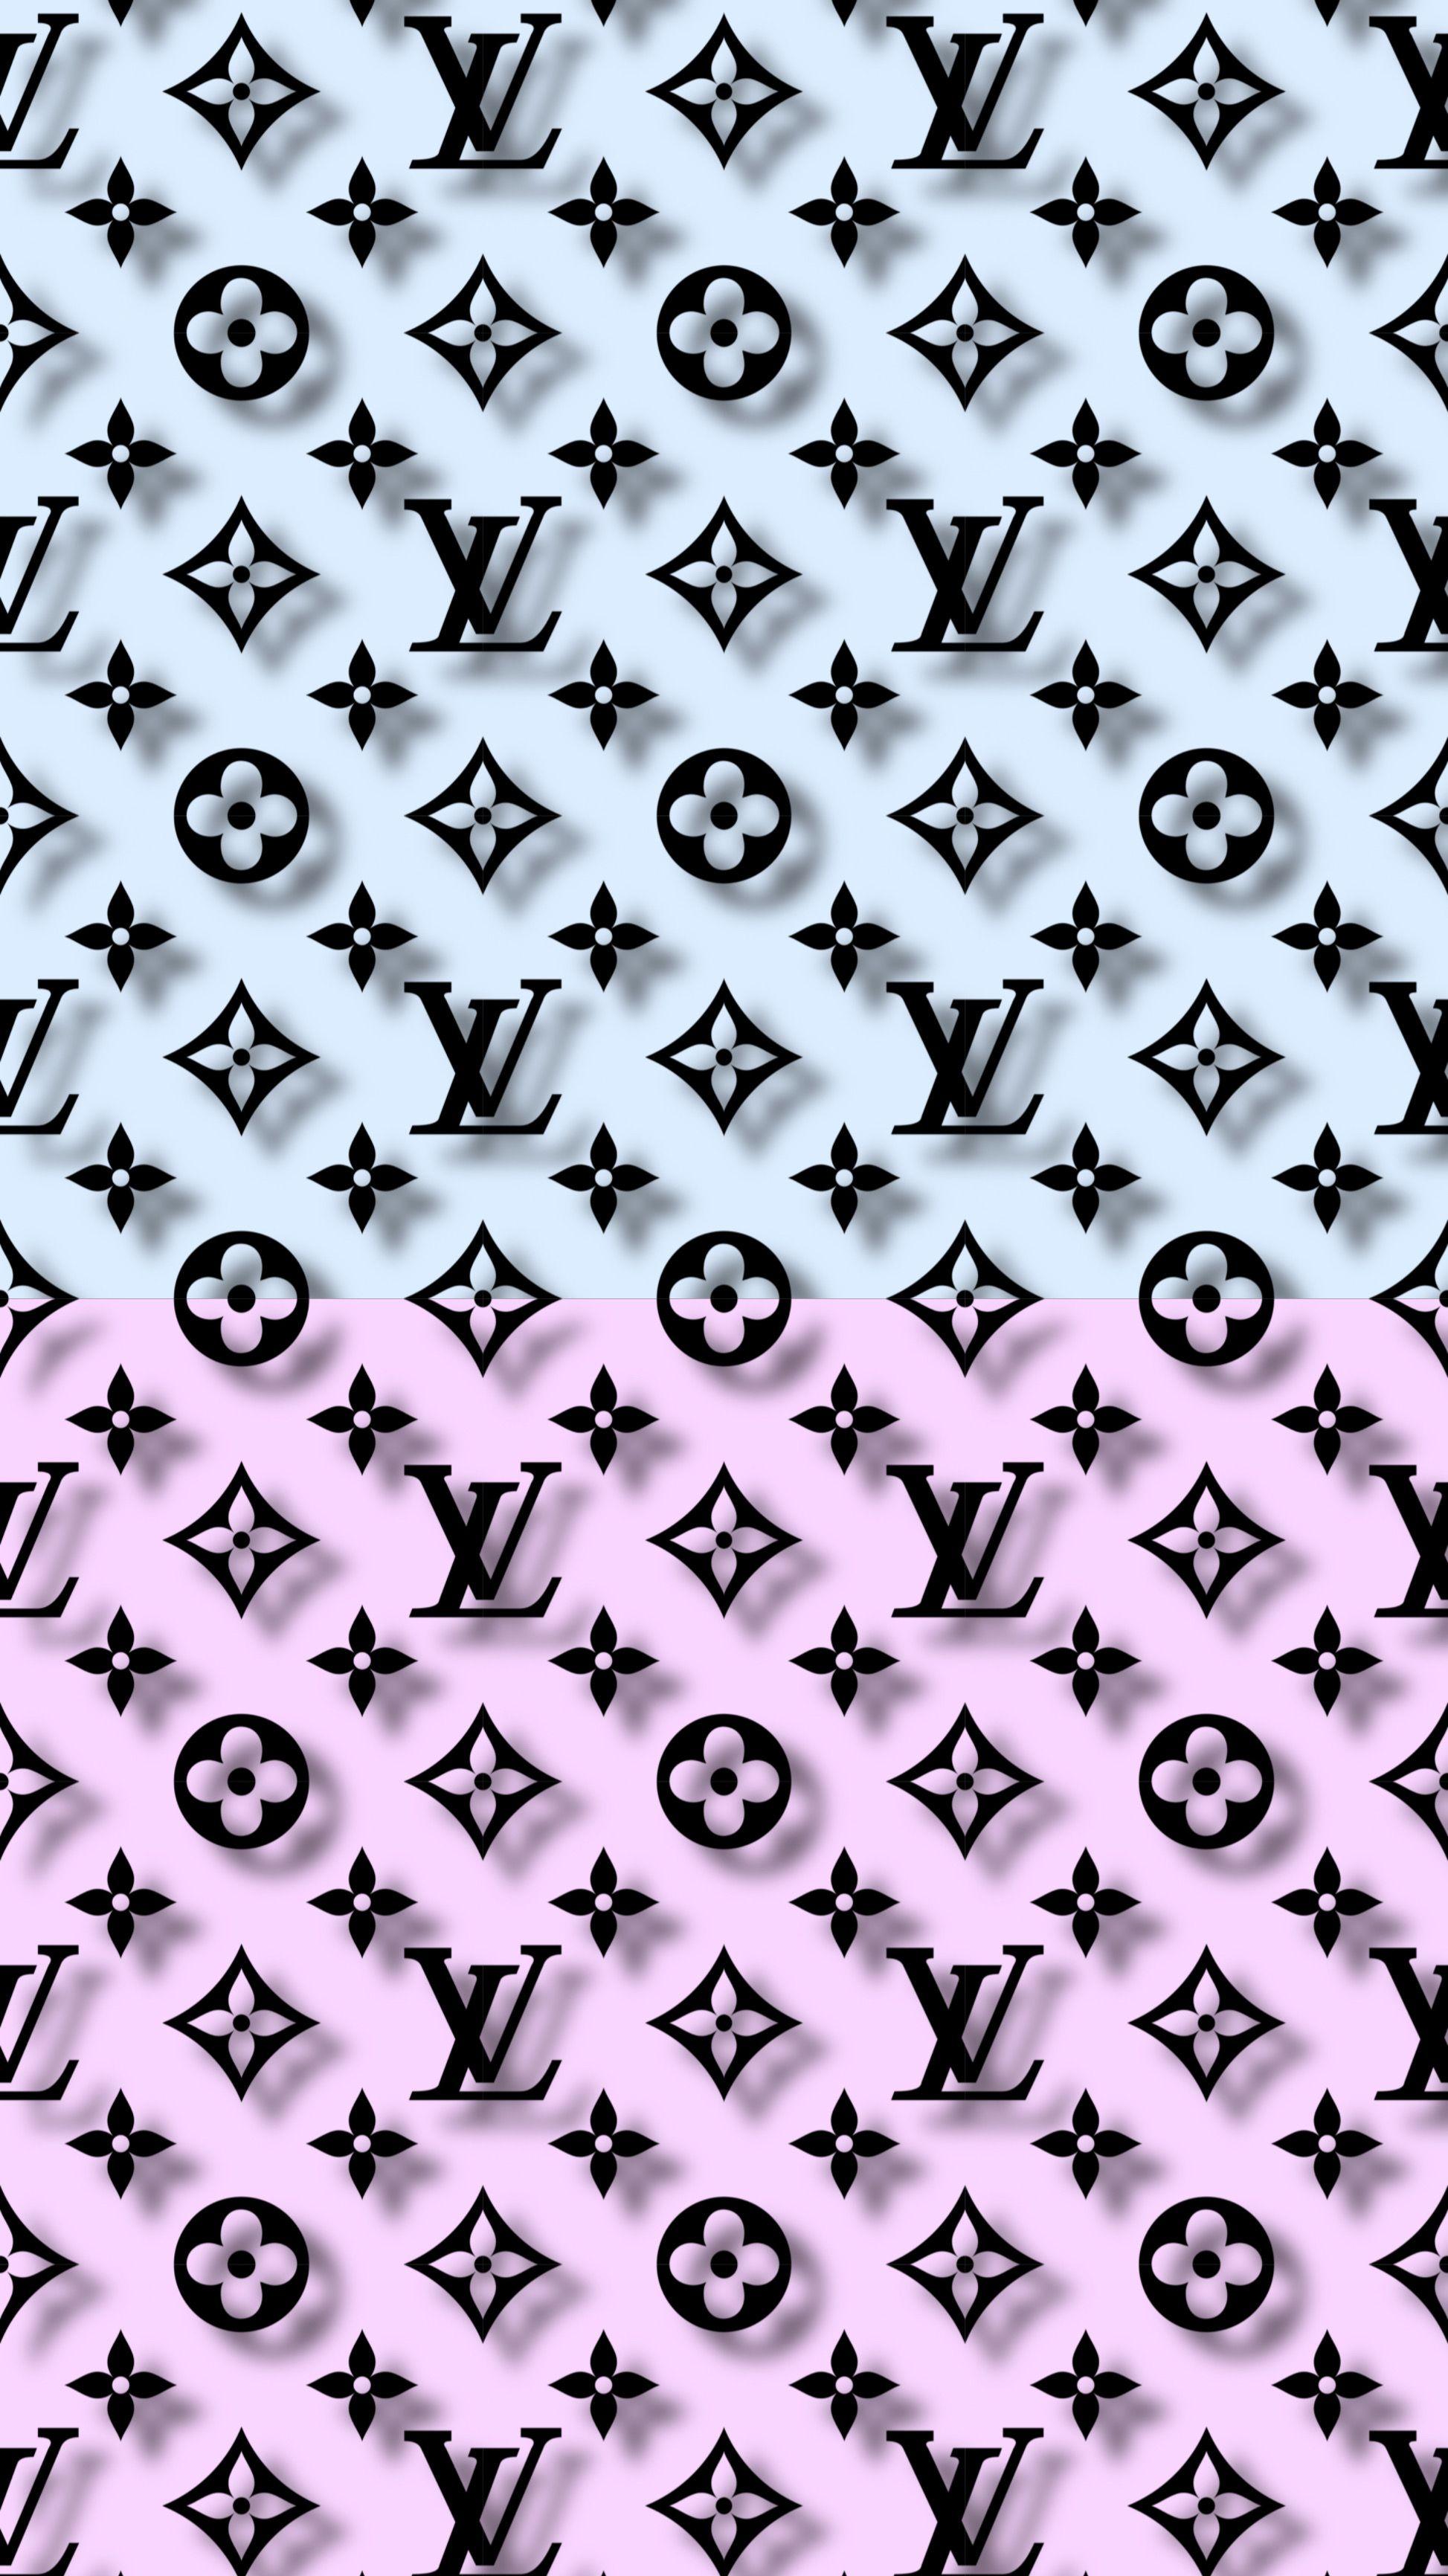 Lv Louisvuitton Logo Icon Design Png Hd Fashion Sticker Wallpaper Aesthe Iphone Wallpaper Girly Cartoon Wallpaper Iphone Iphone Homescreen Wallpaper